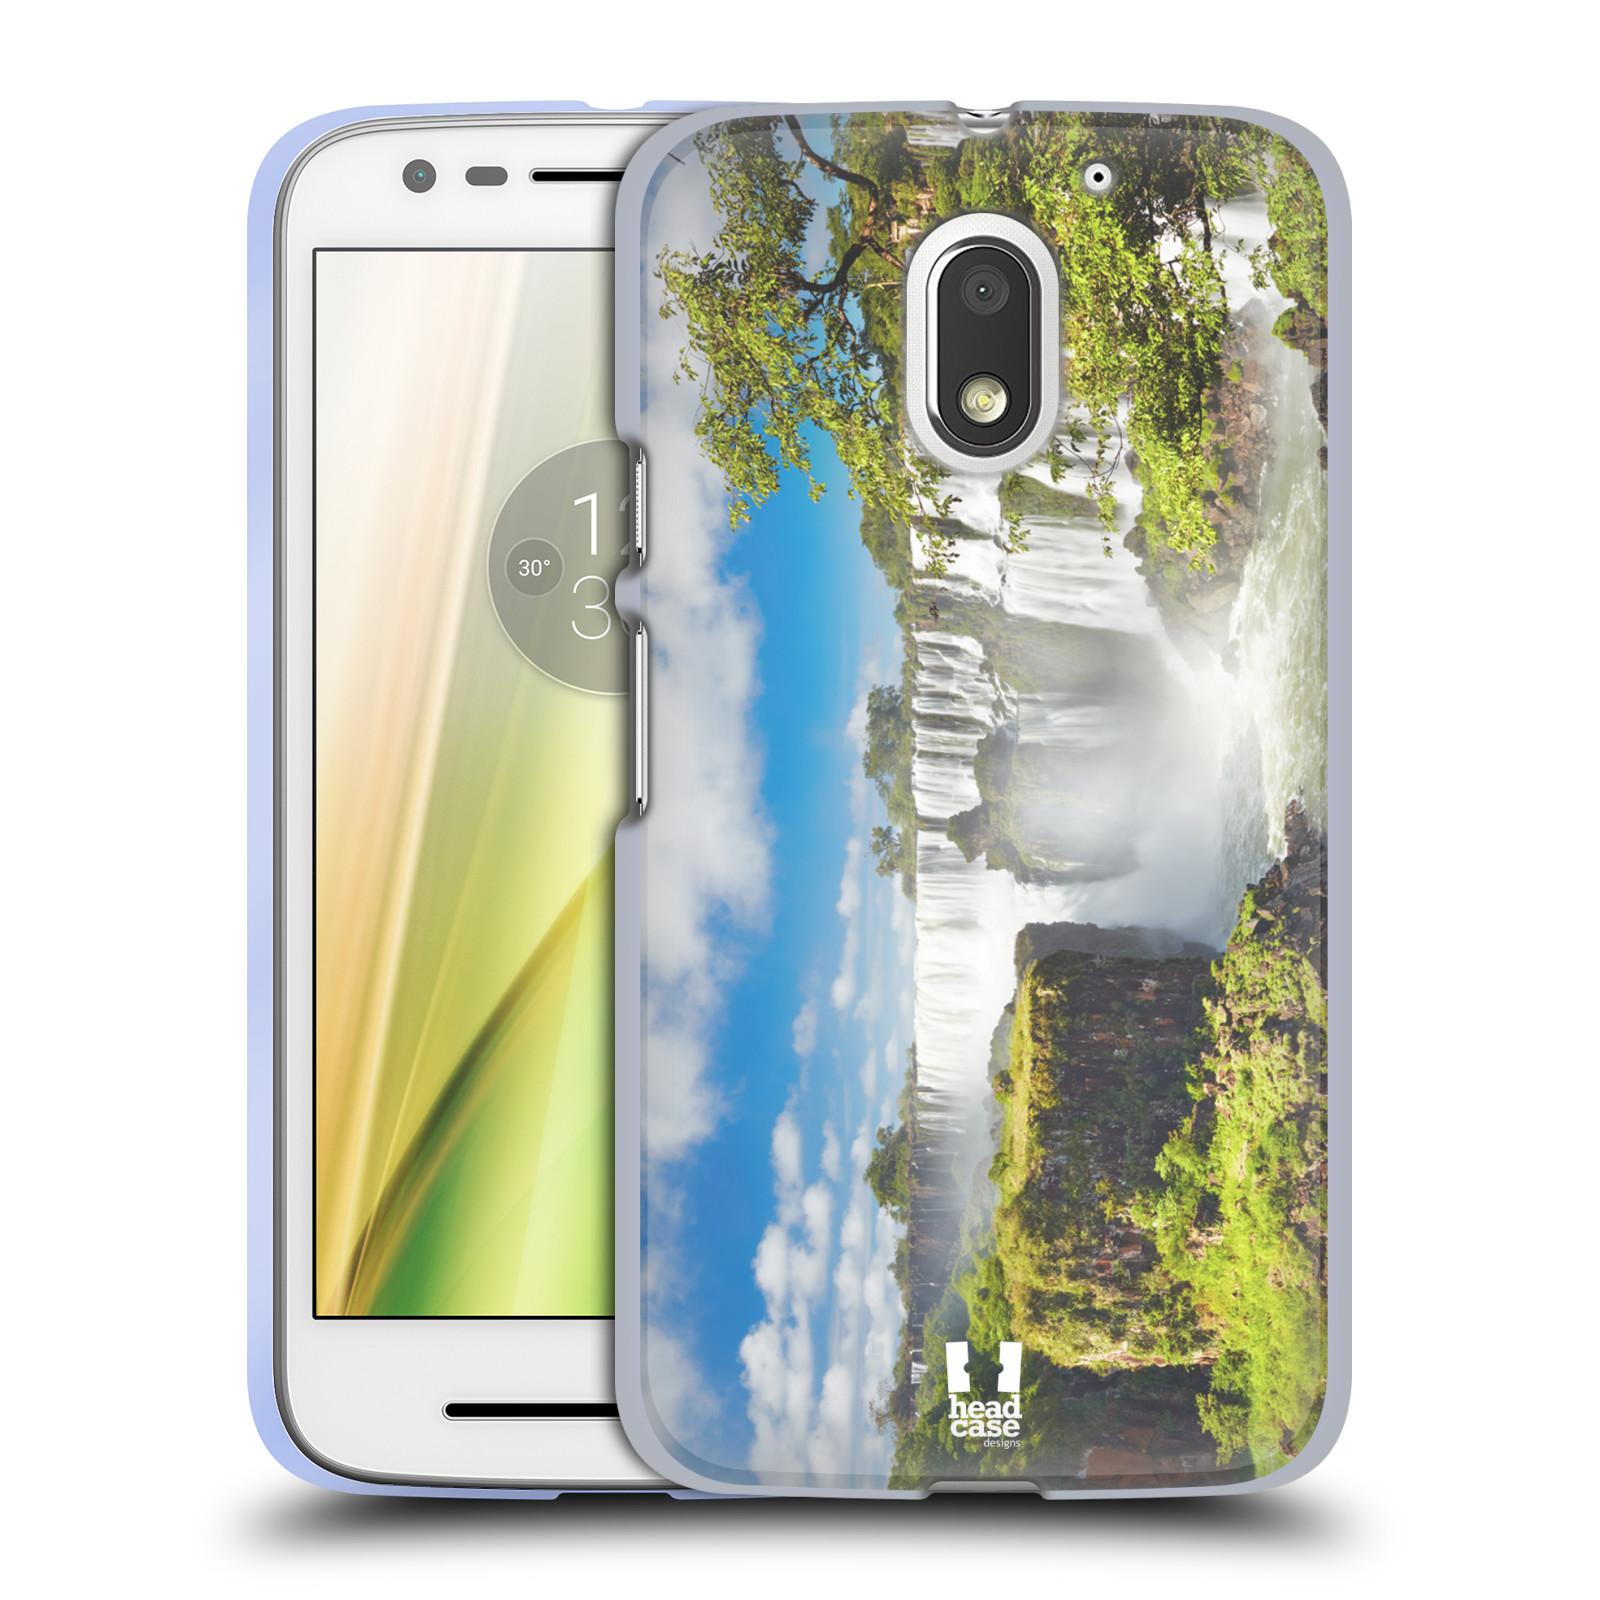 Funda HEAD CASE DESIGNS CON hitos famosos Gel Suave para Motorola Moto E3 Power